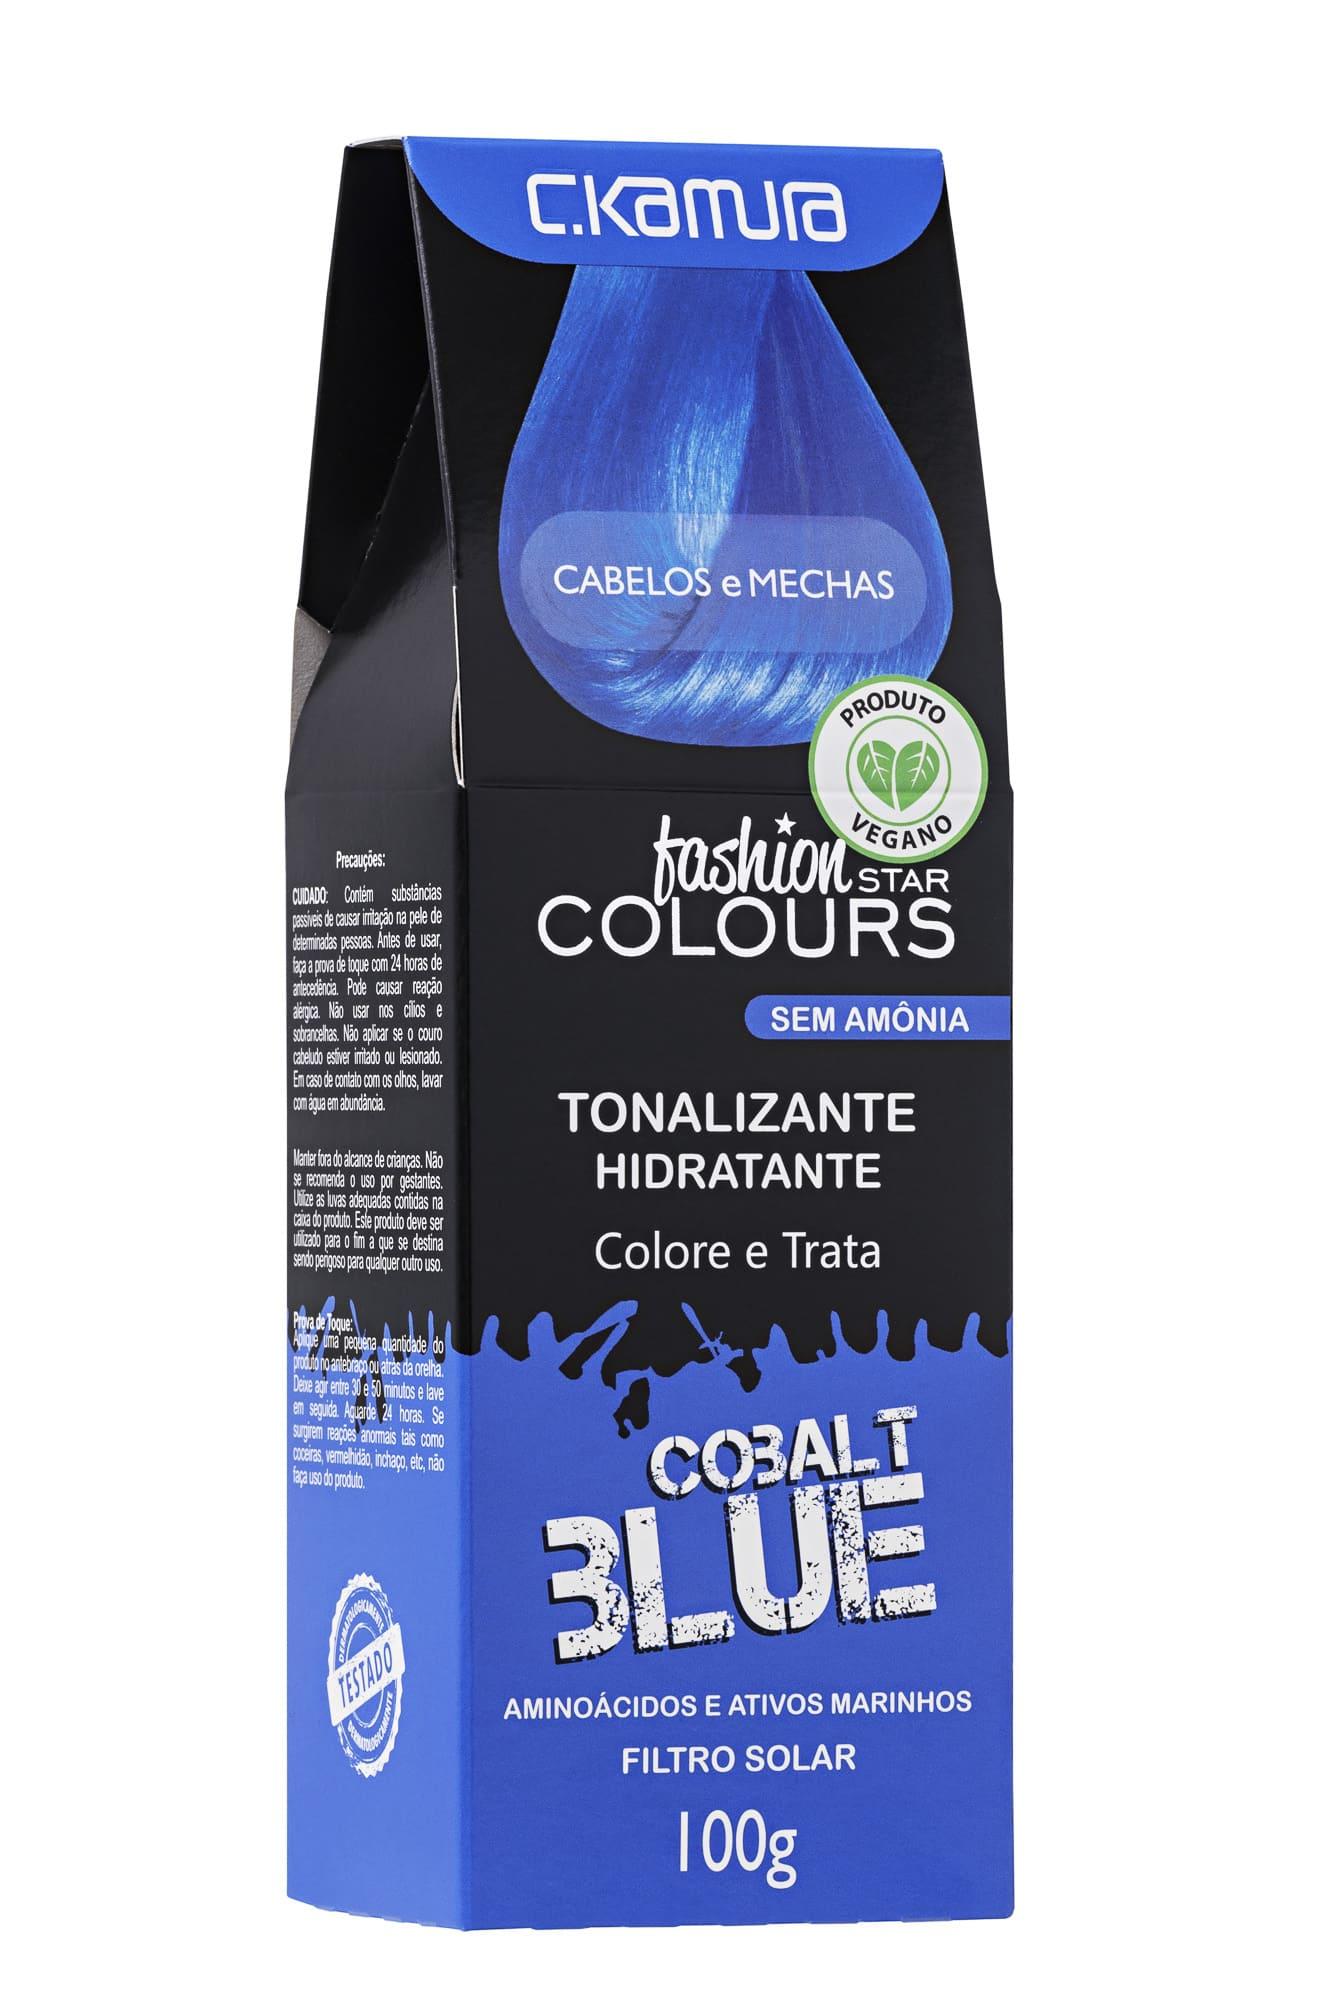 Tonalizante Cobalt Blue Azul Fashion Star Colours Ckamura